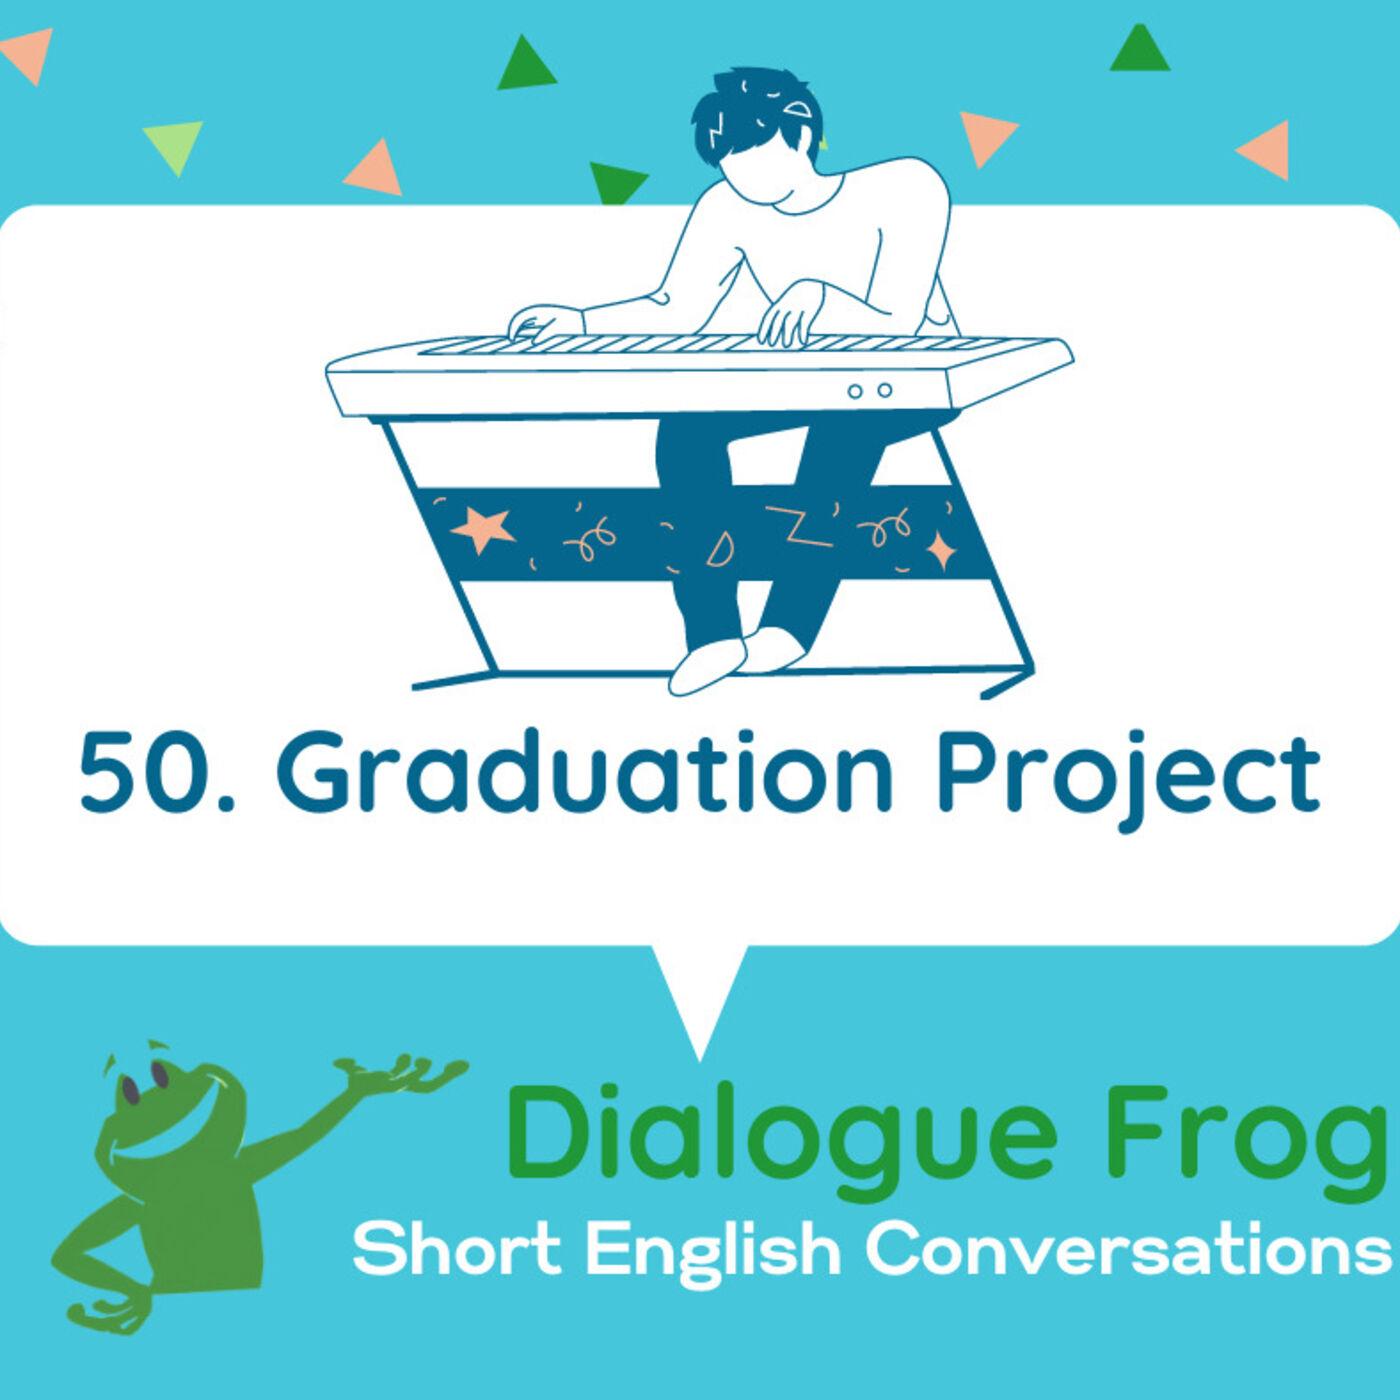 050 Graduation Project- Dialogue Conversation